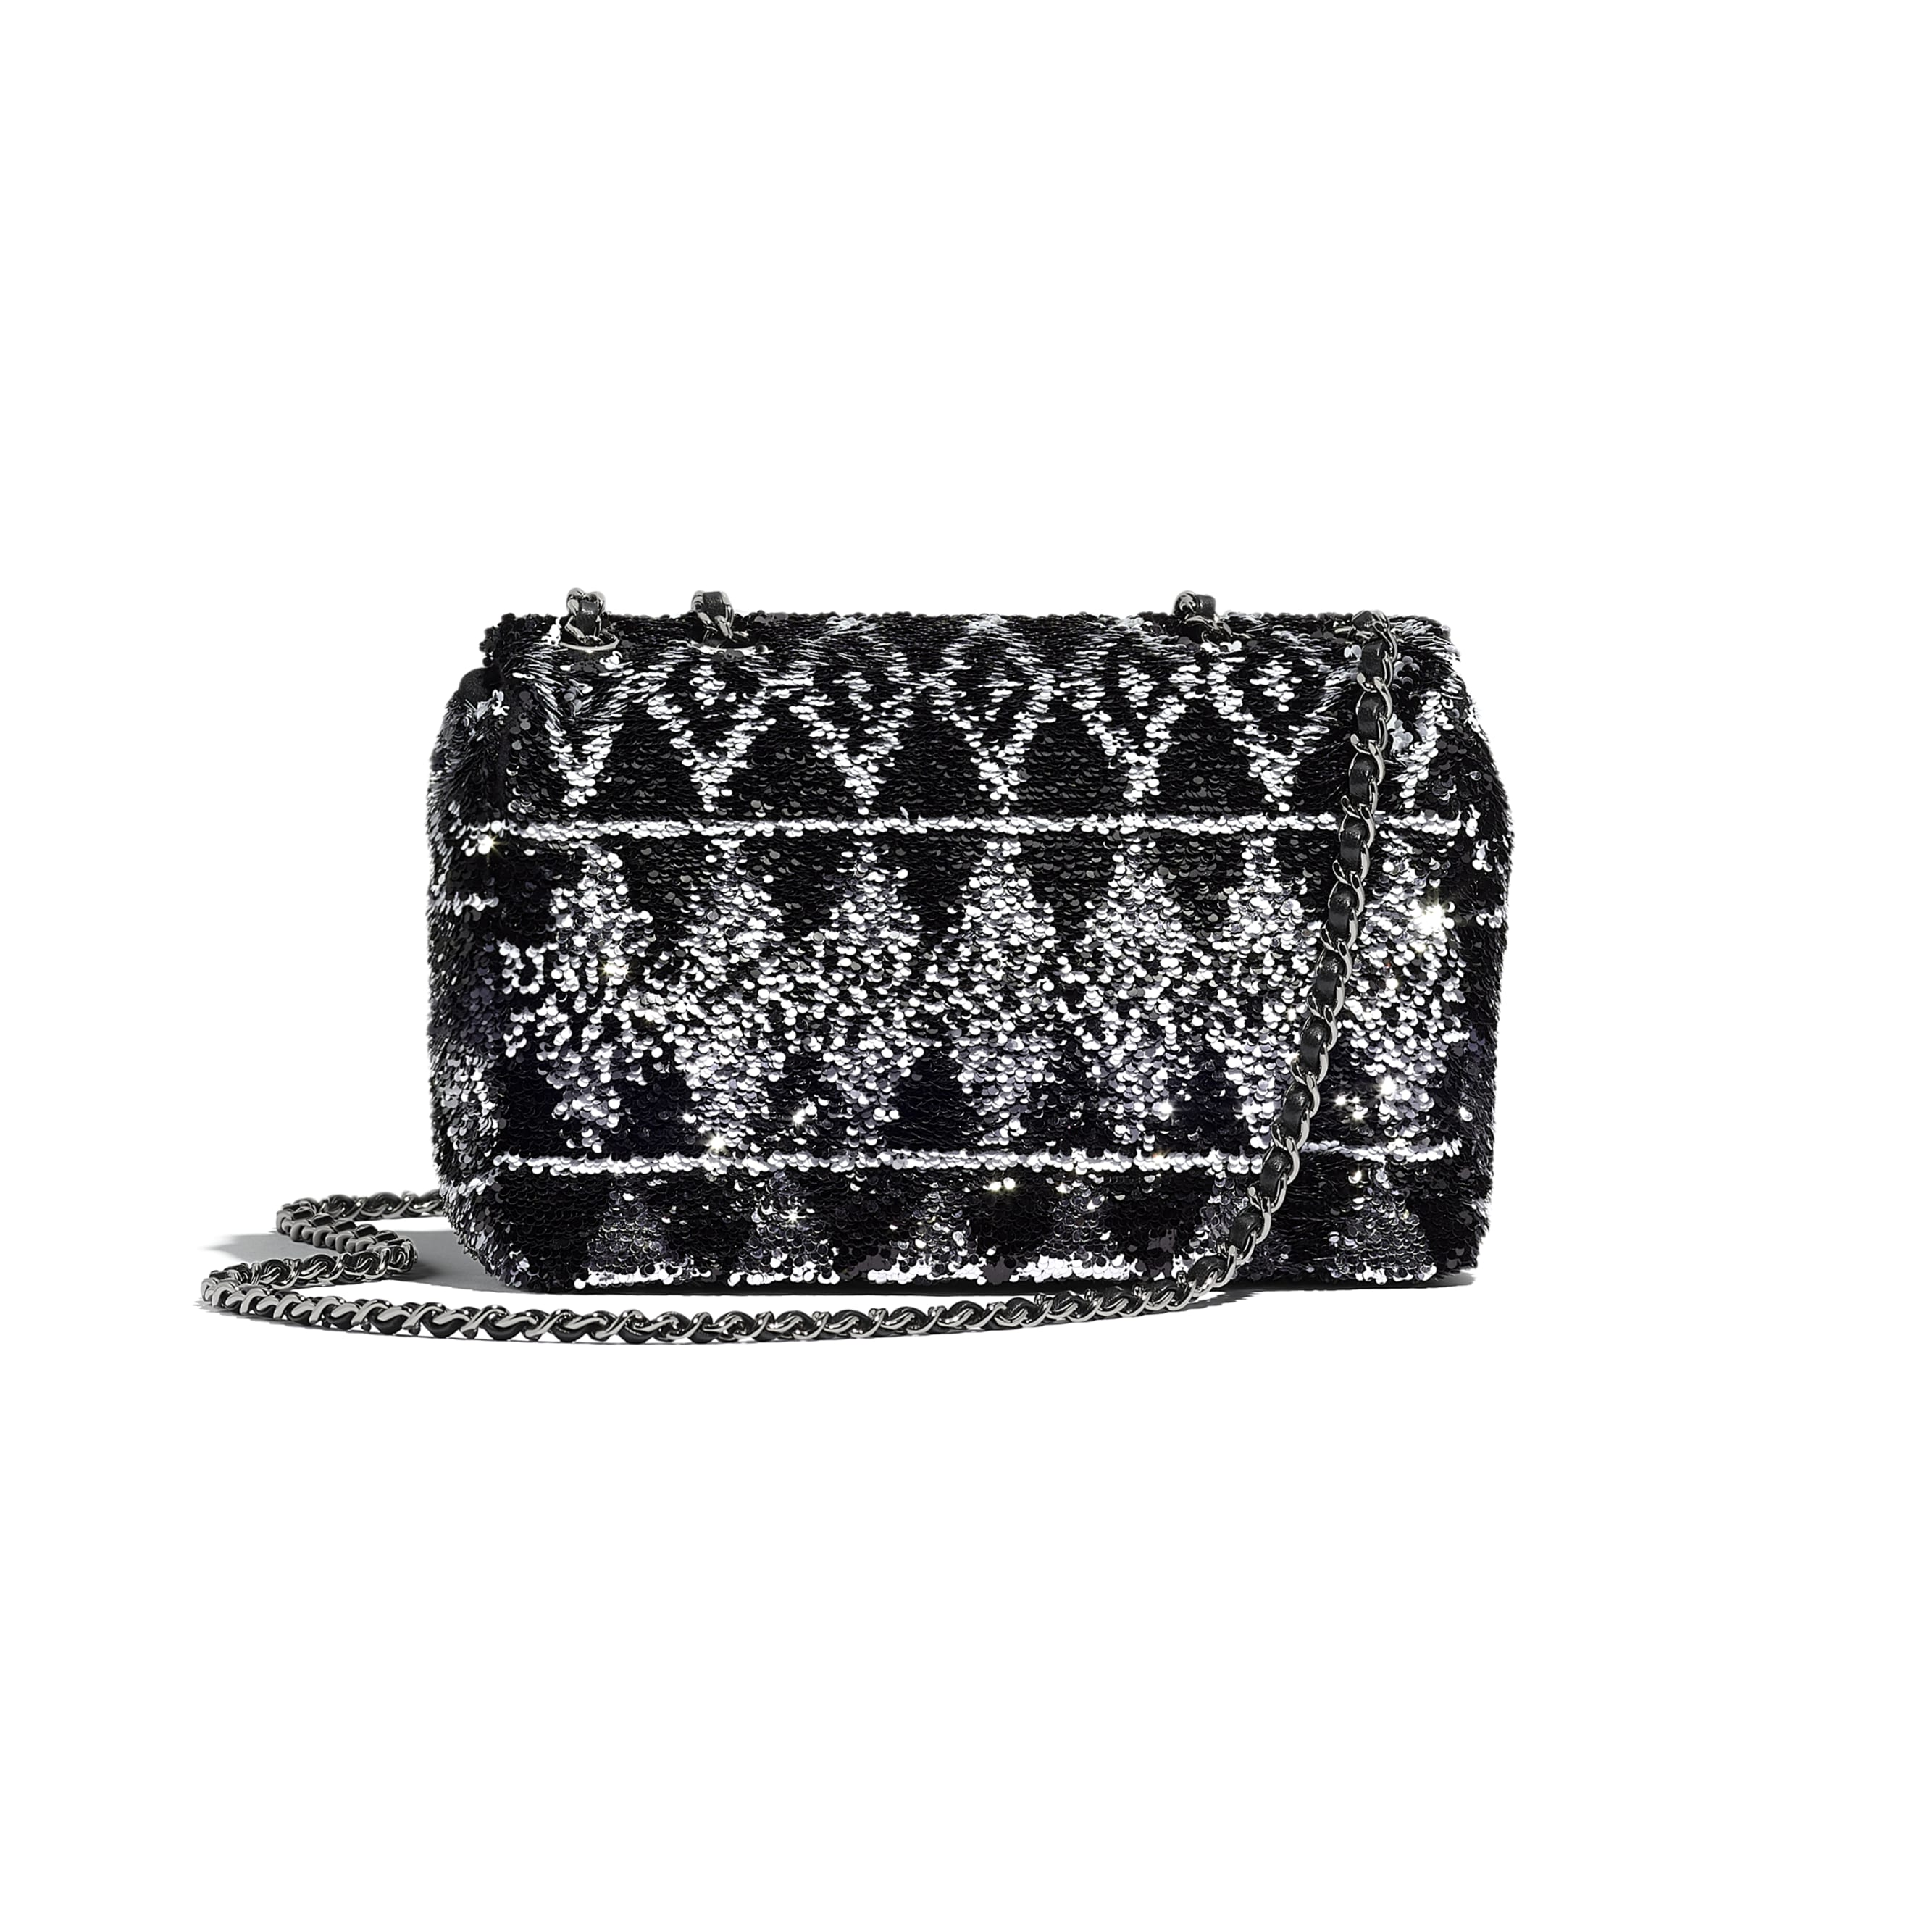 Flap Bag - Silver & Black - Sequins & Ruthenium-Finish Metal - Alternative view - see standard sized version